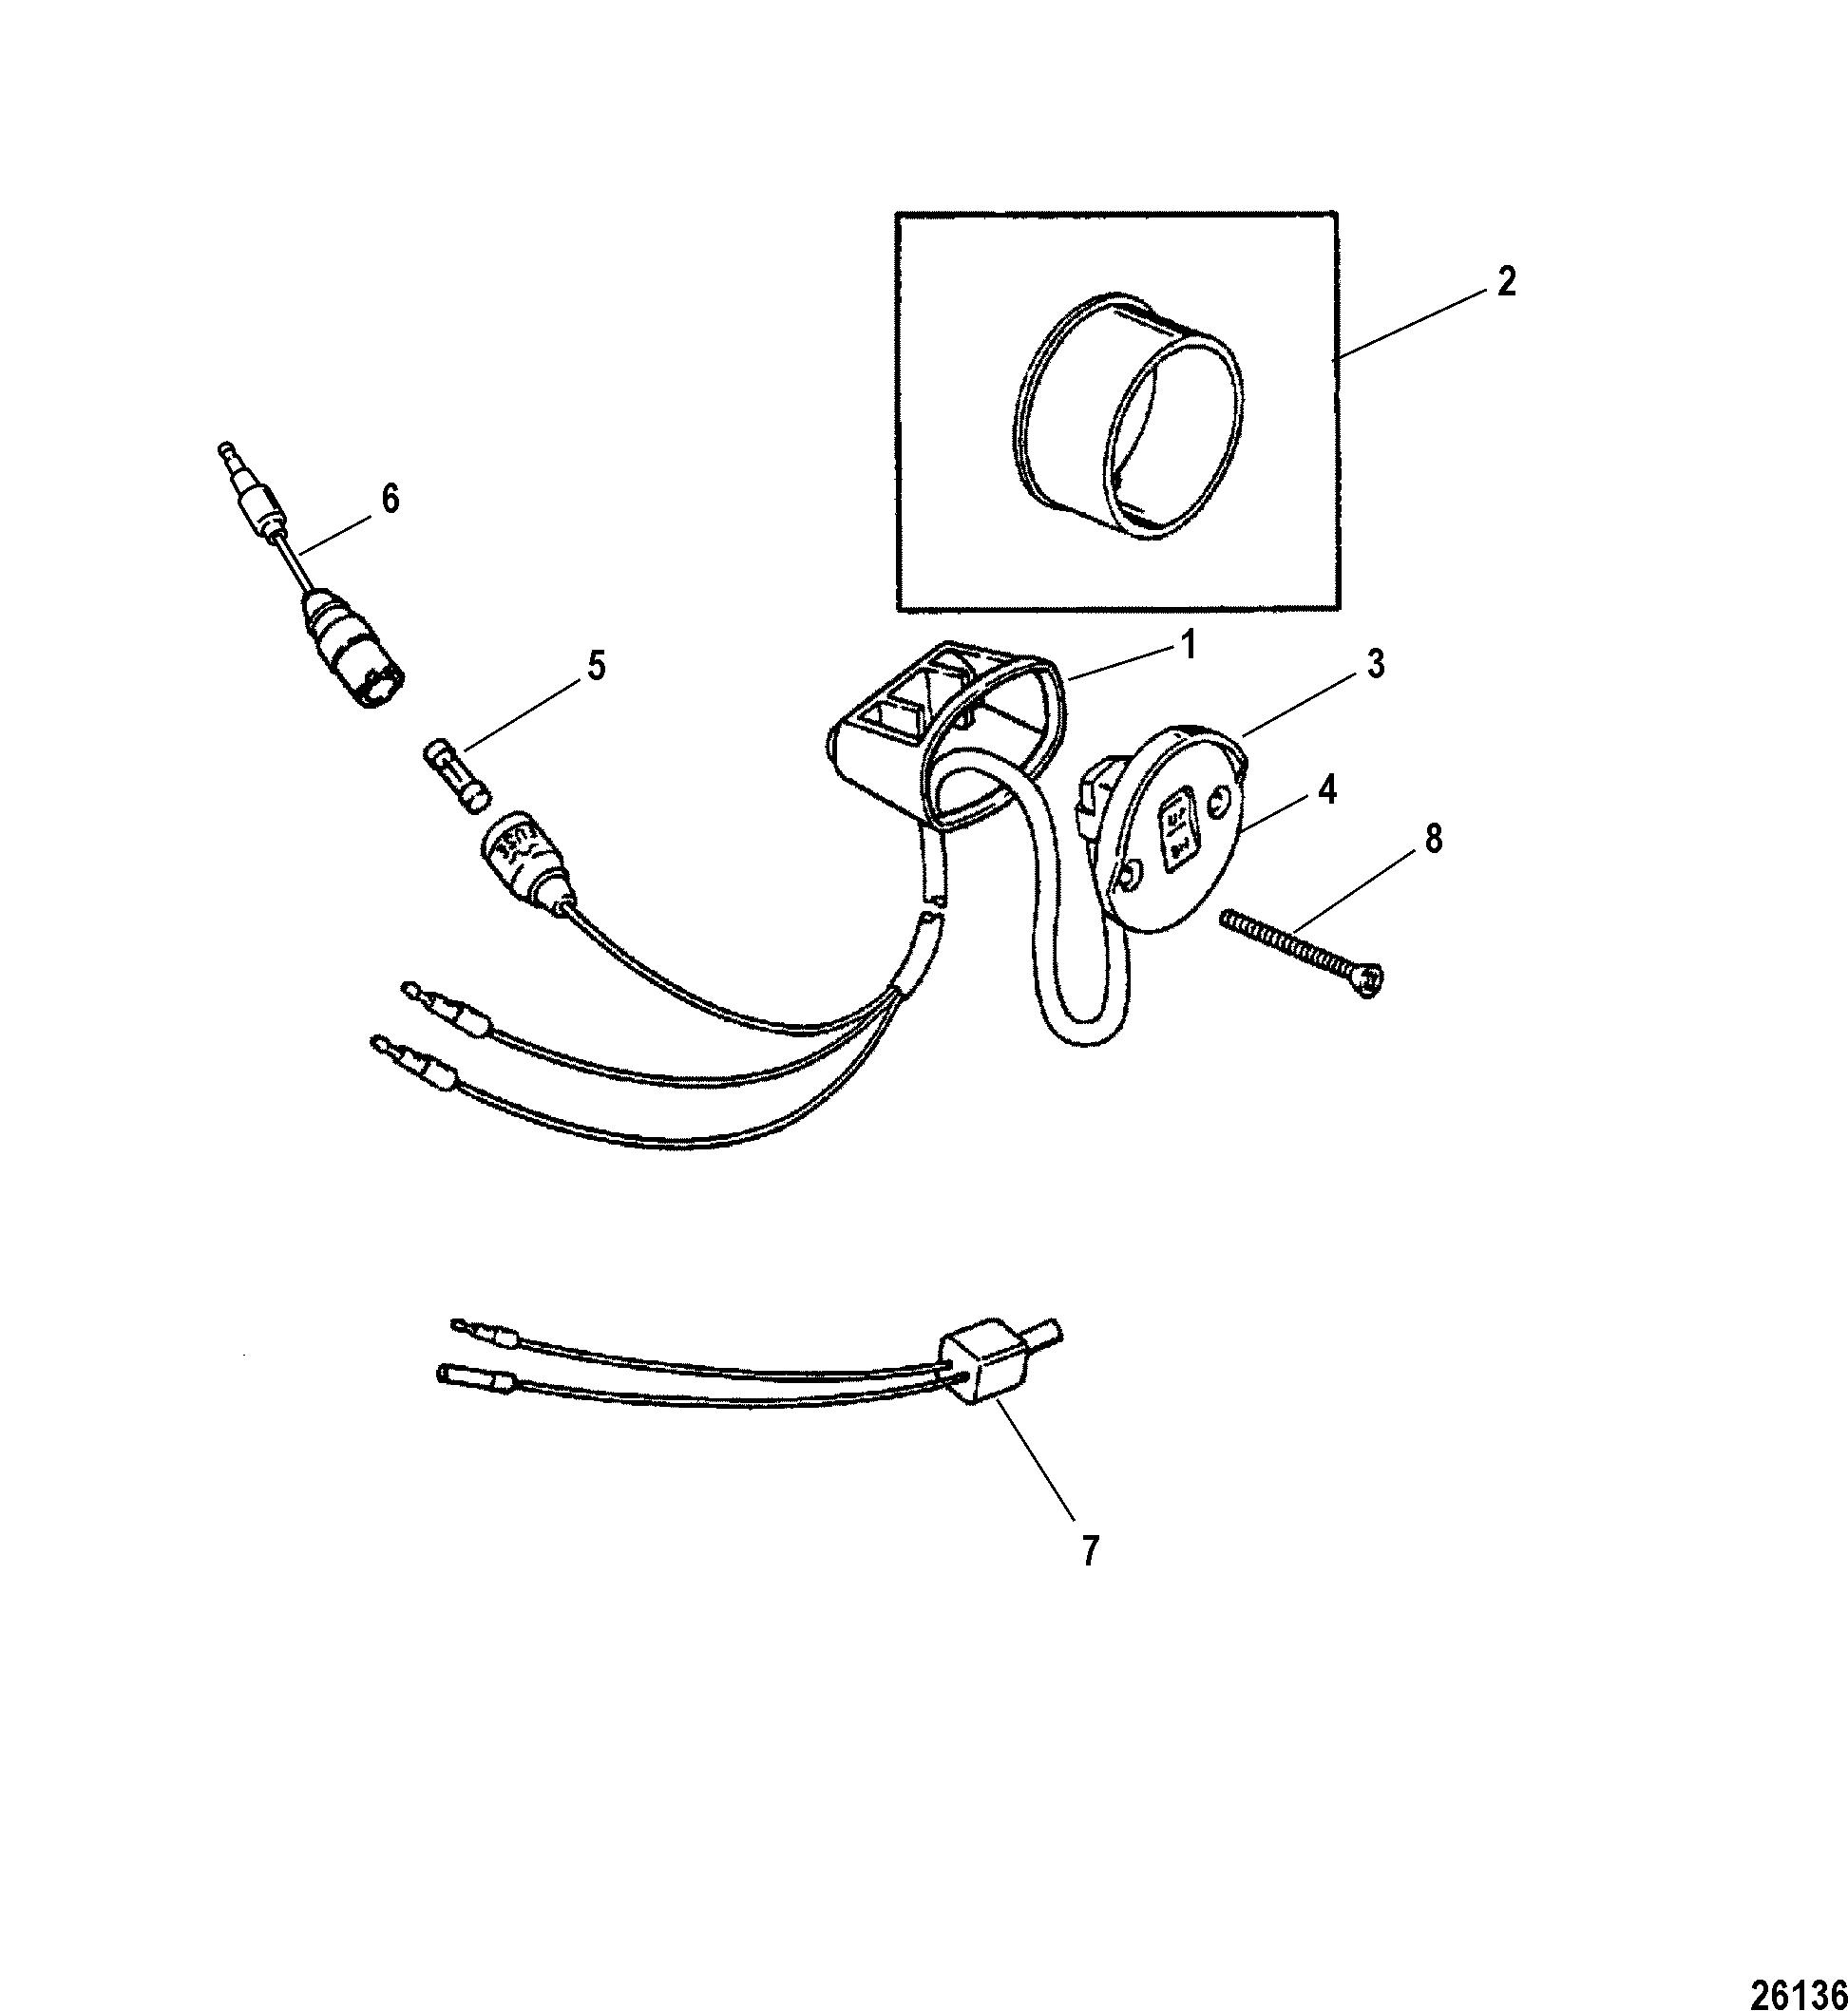 Каталог запчастей ACCESSORIES Electrical 1994 & Up